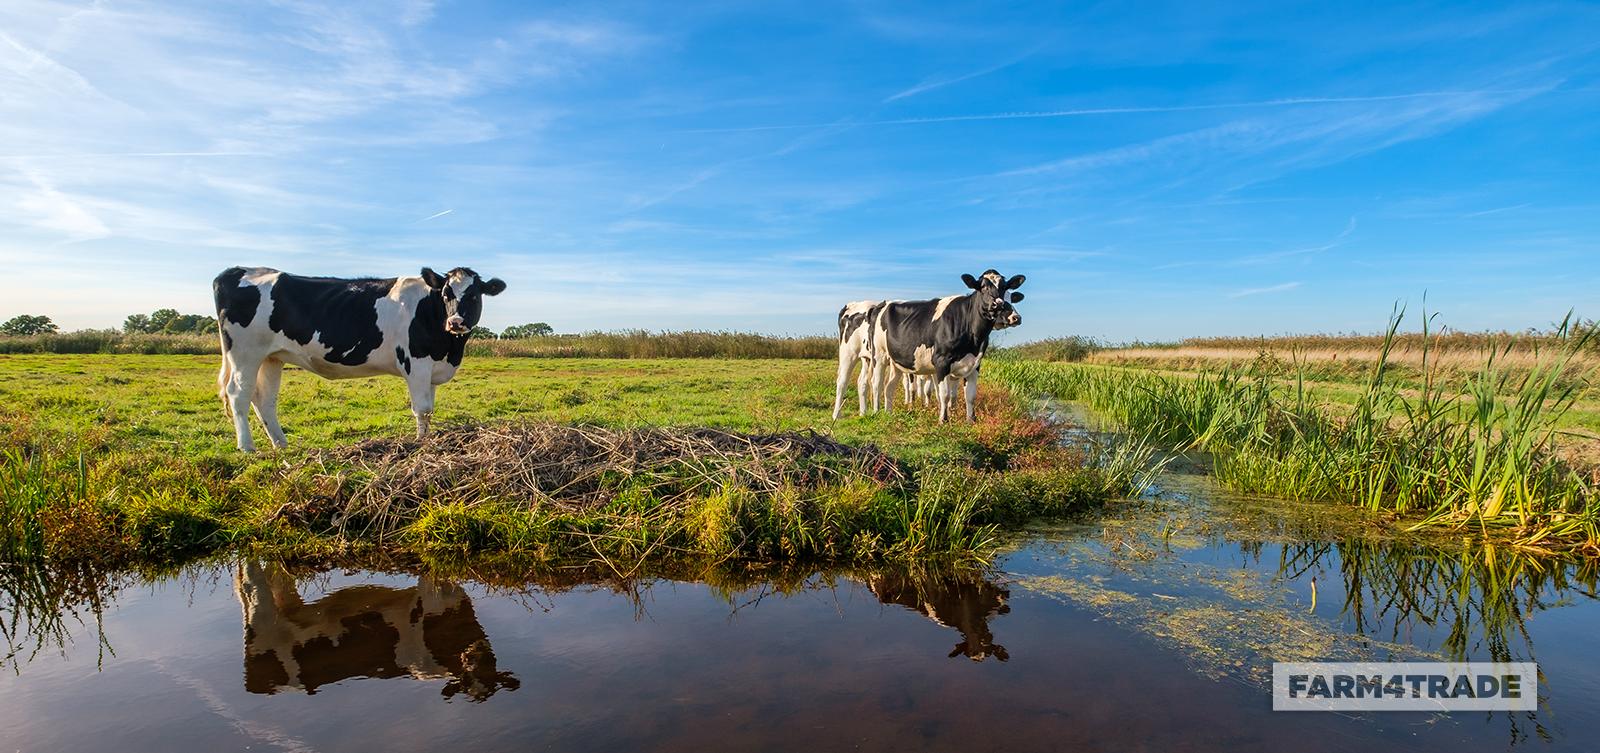 The impact of ammonia emissions on biodiversity - Blog Farm4Trade